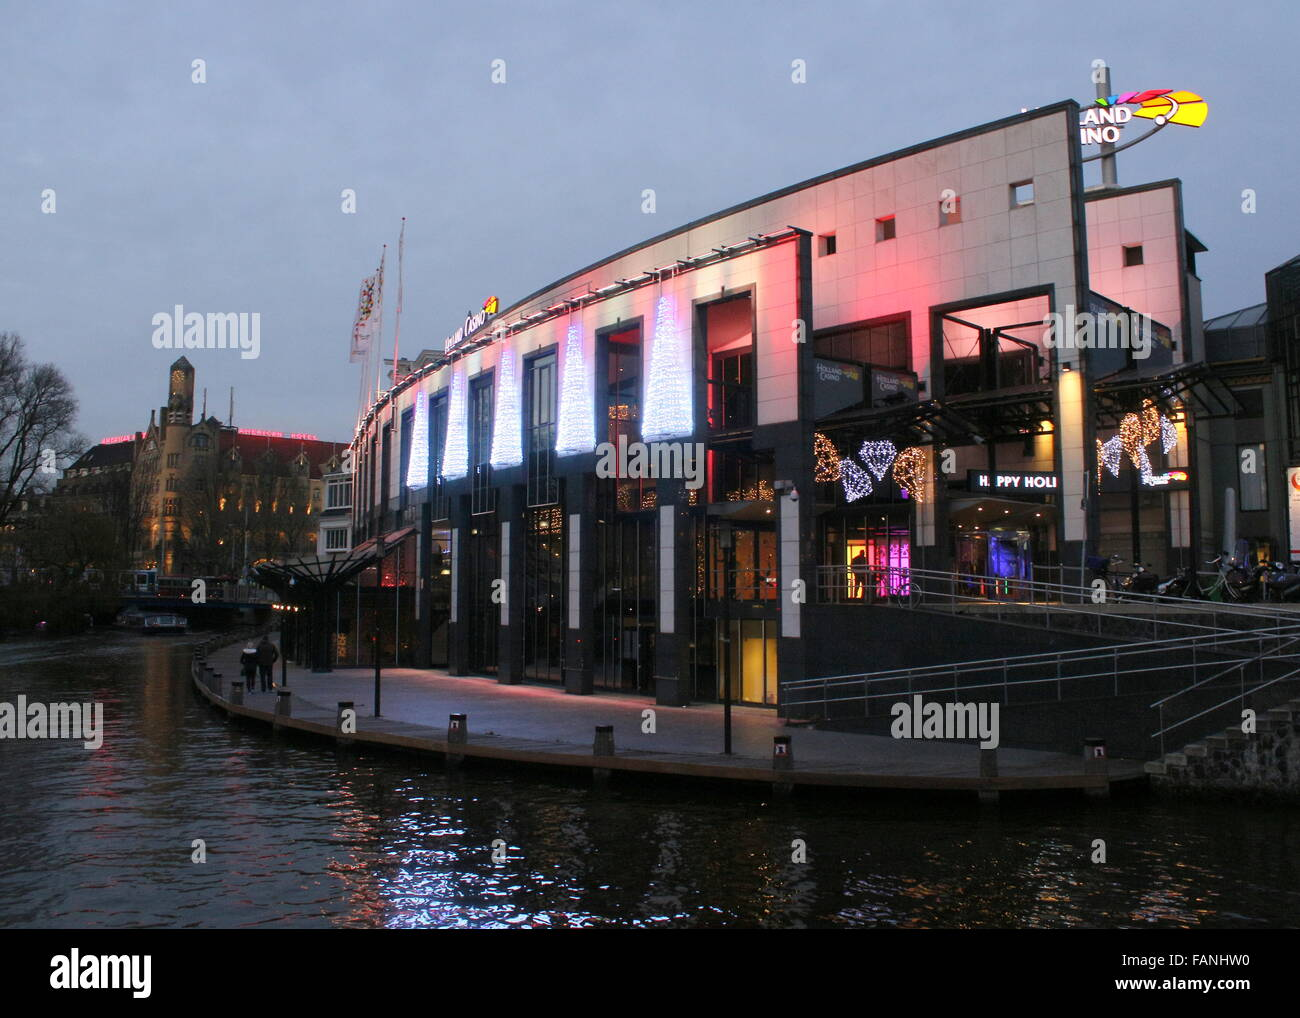 Amsterdamcasino